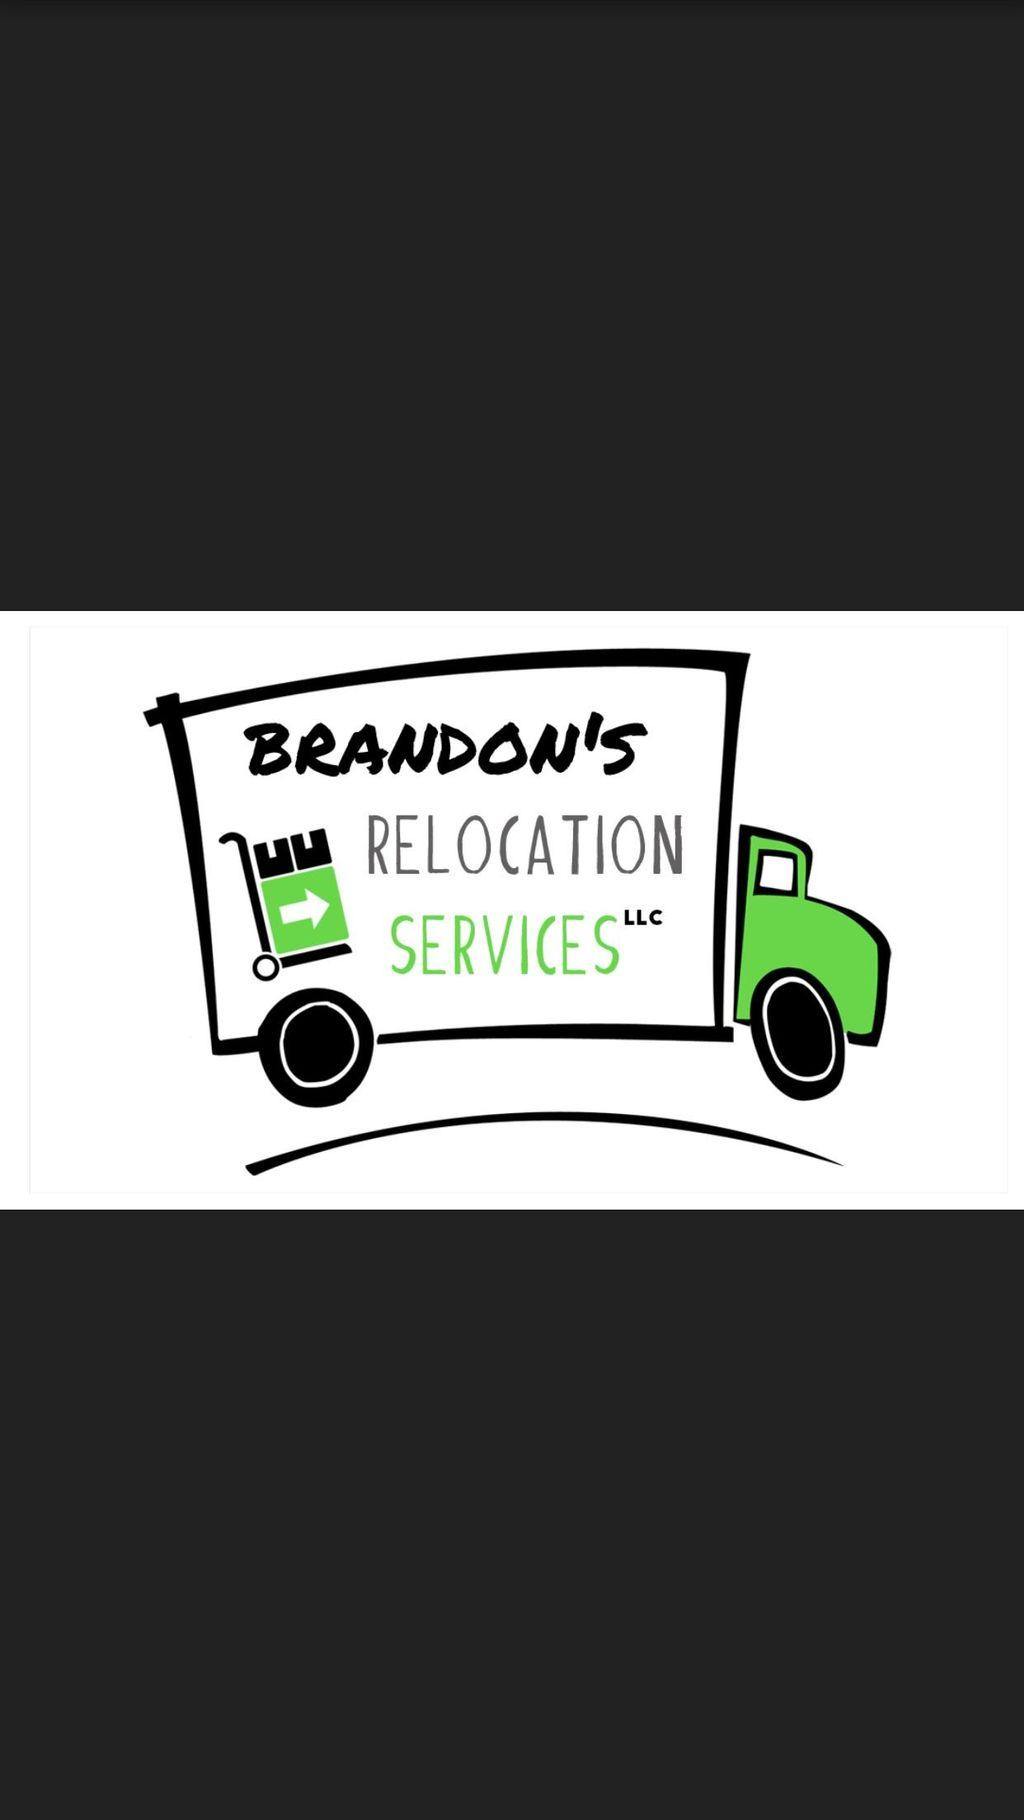 Brandon's Relocation Services LLC